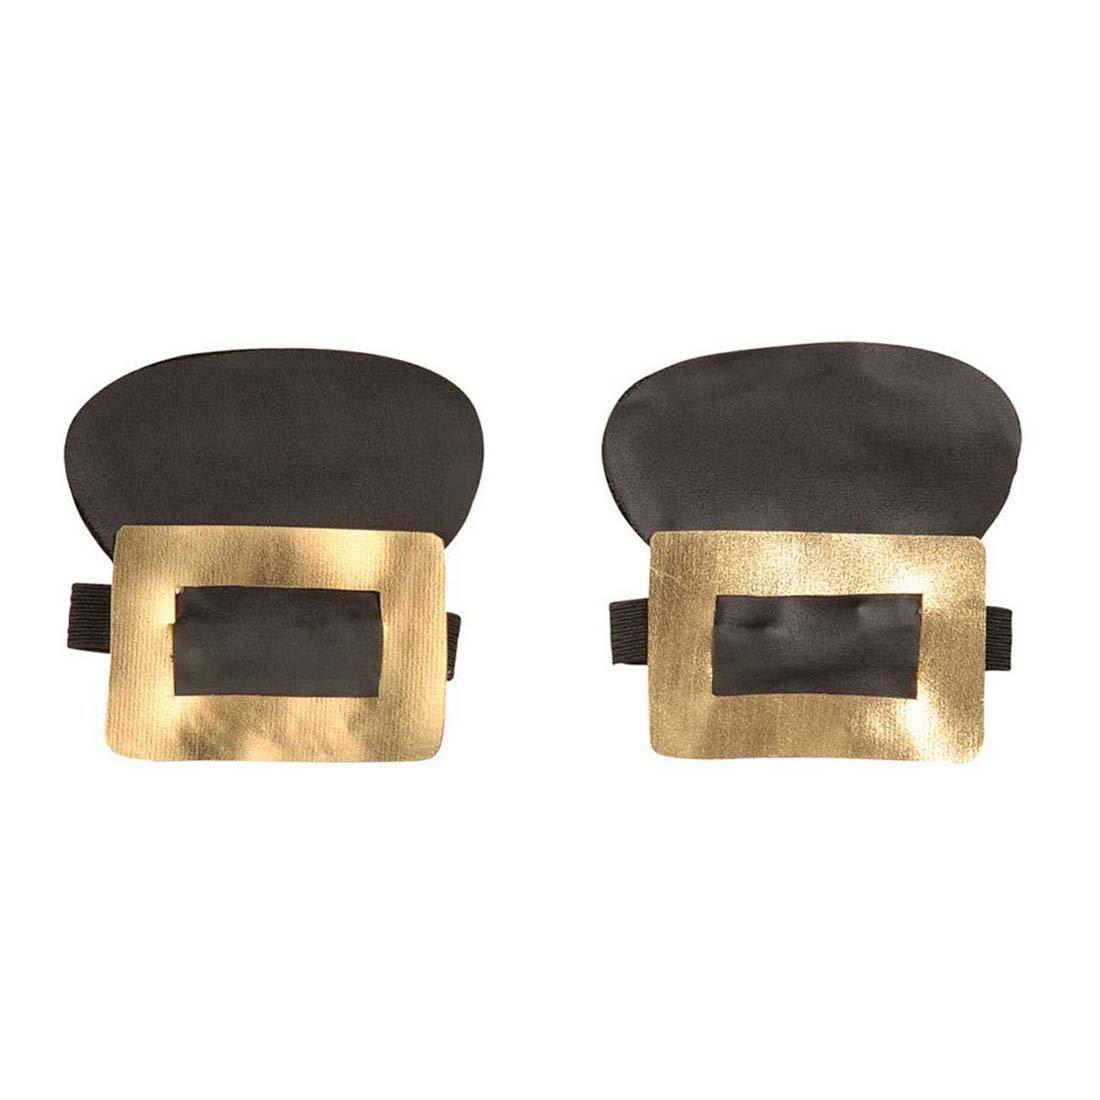 Mittelalterliche Schuhschließe gold Barocke Schuhschnallen barocker Schuhschmuck